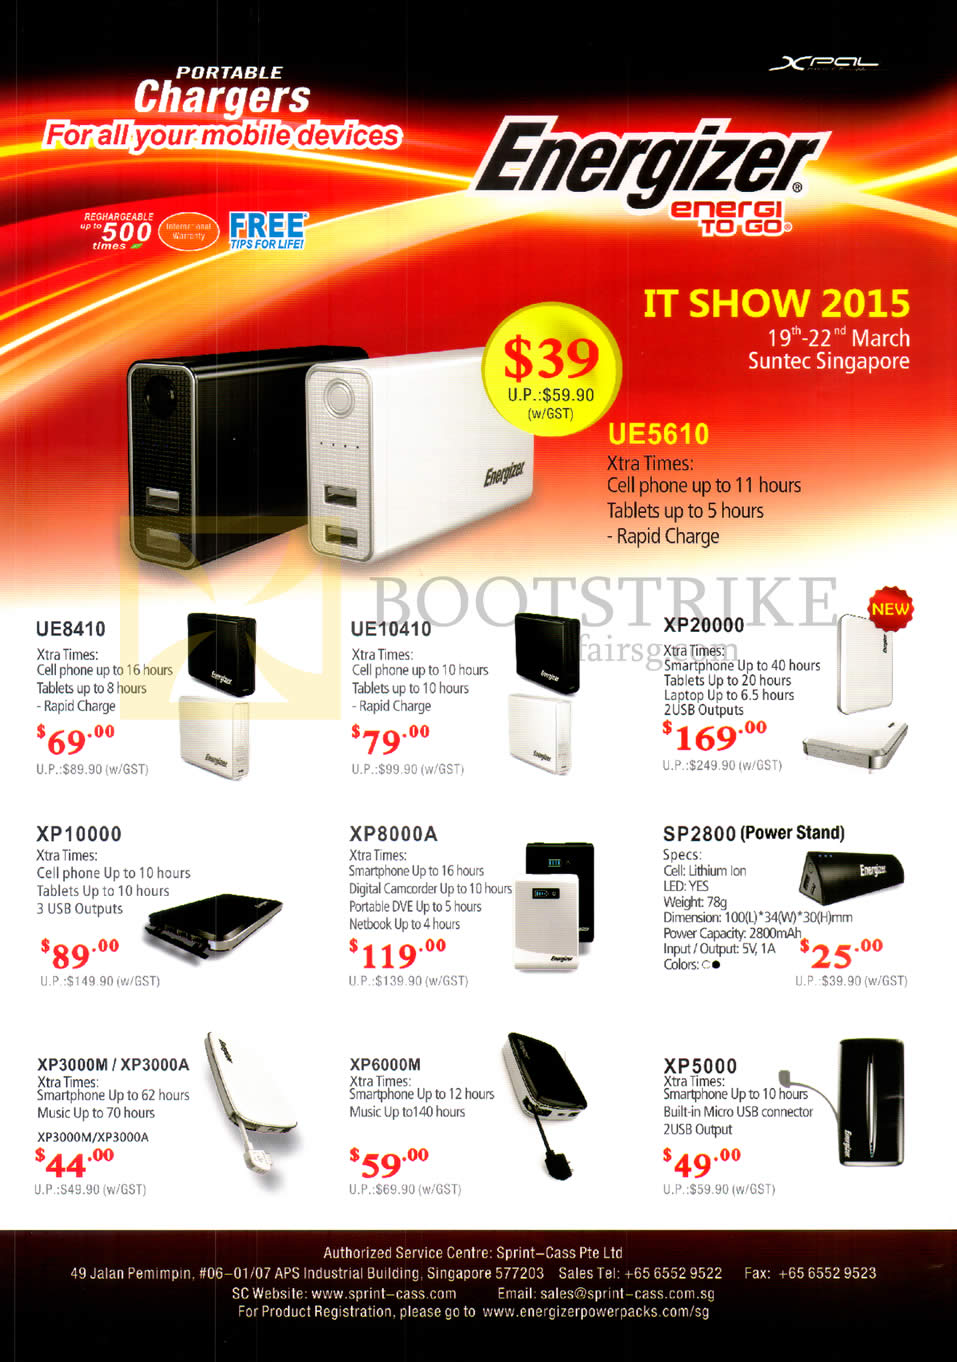 IT SHOW 2015 price list image brochure of Sprint-Cass Energizer Power Banks UE8410, 10410, XP20000, 10000, 8000A, 3000M, 3000A, 6000M, 5000, SP2800